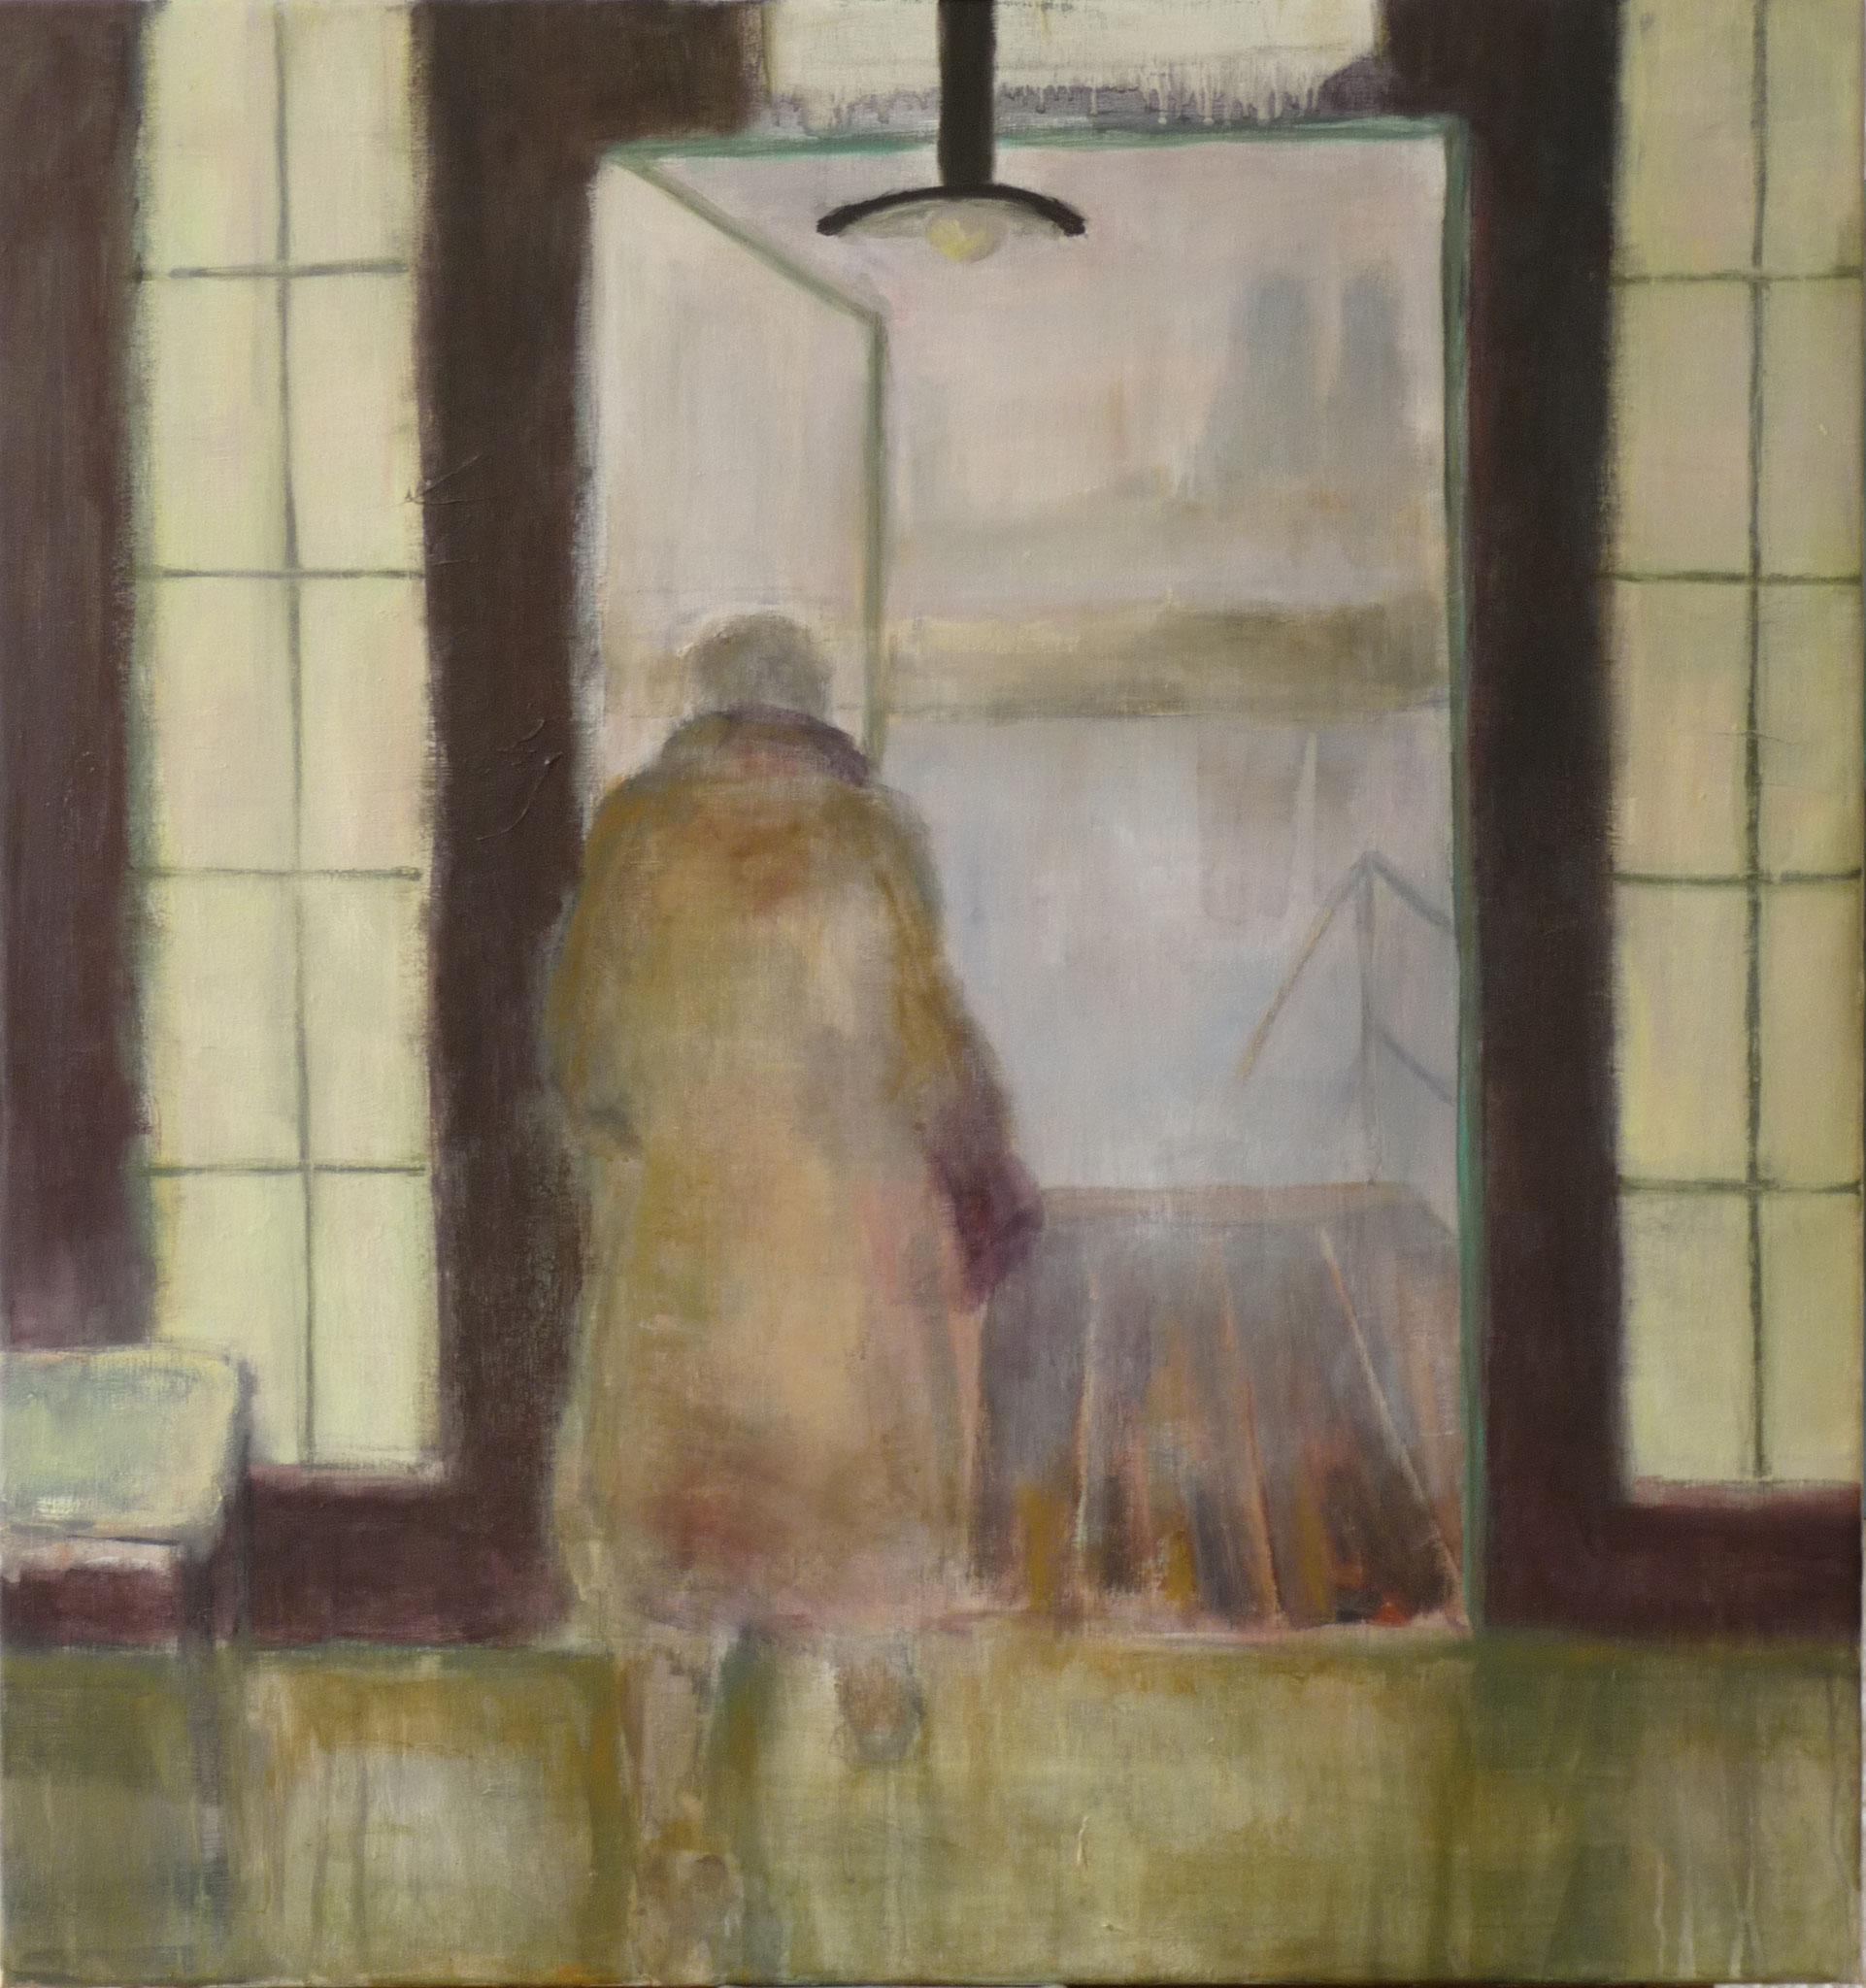 On threshold - Hommage à Tarkovsky   ---   2012 - Acrylique sur toile - 80 x 80 cm